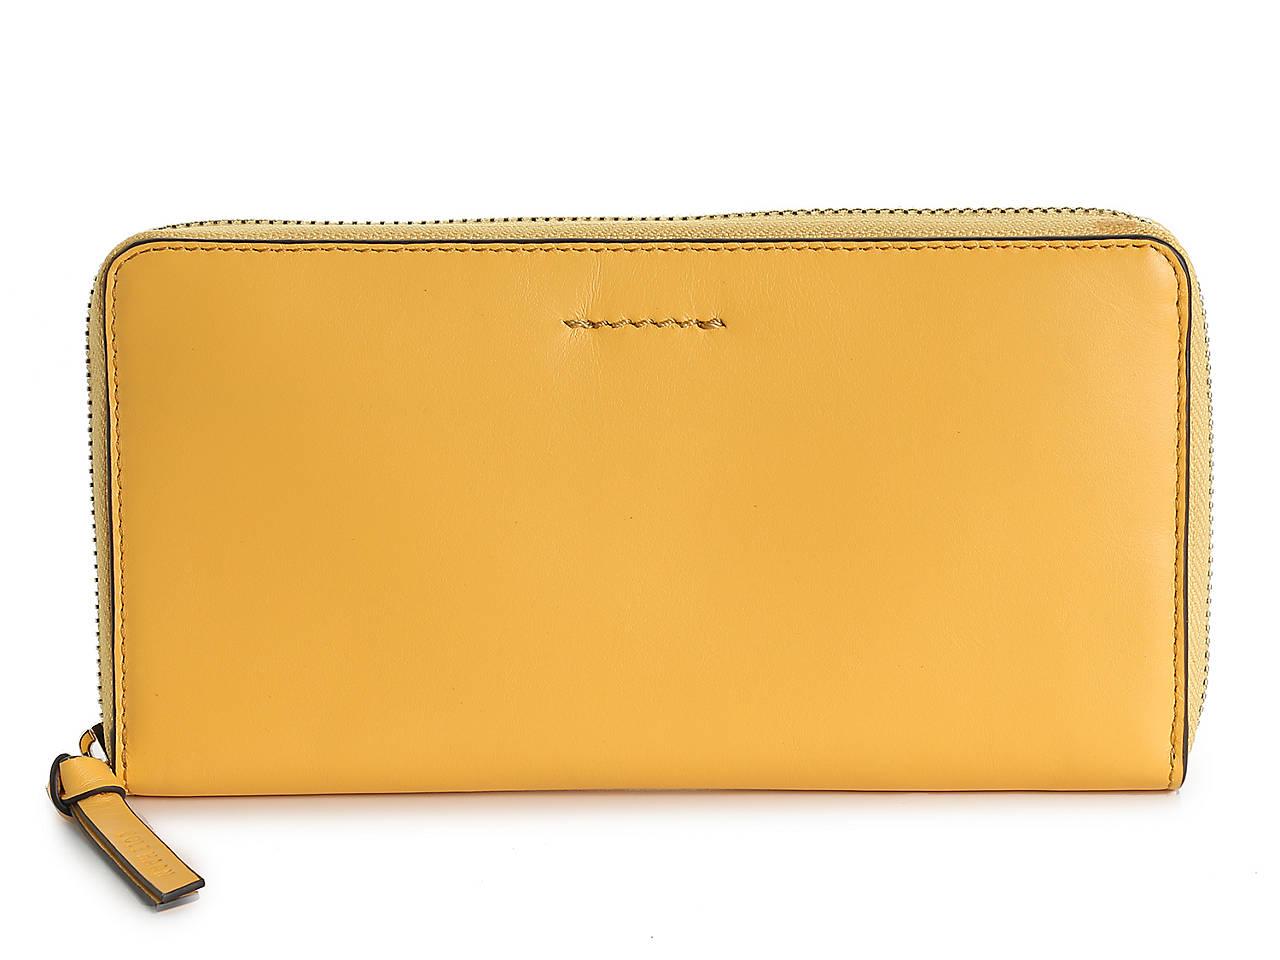 4918a0c6f0c Cole Haan Kaylee Leather Wallet Women's Handbags & Accessories | DSW